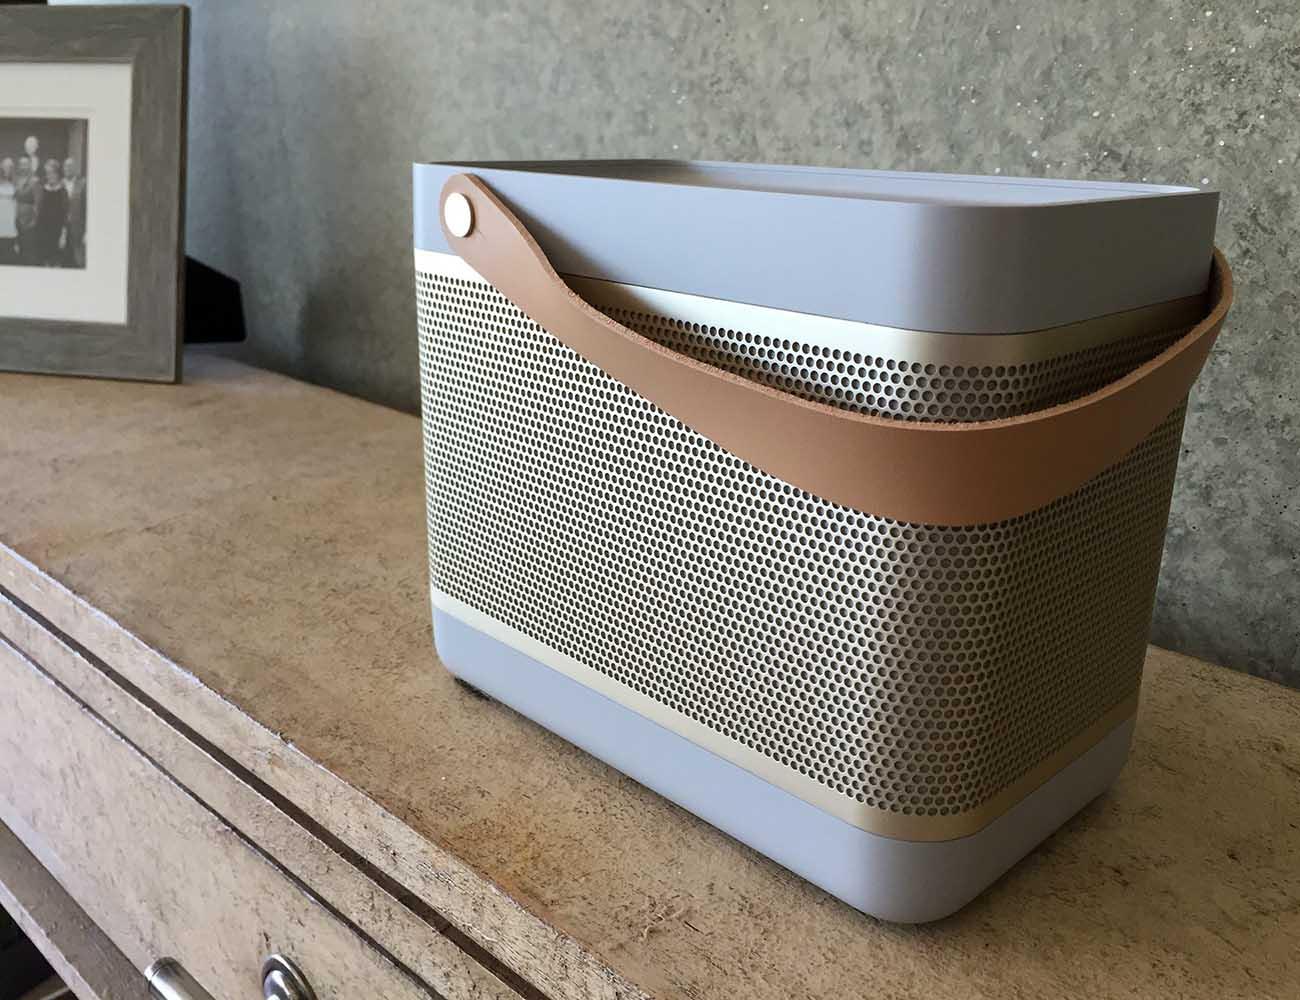 BeoPlay Beolit 15 Portable Speaker